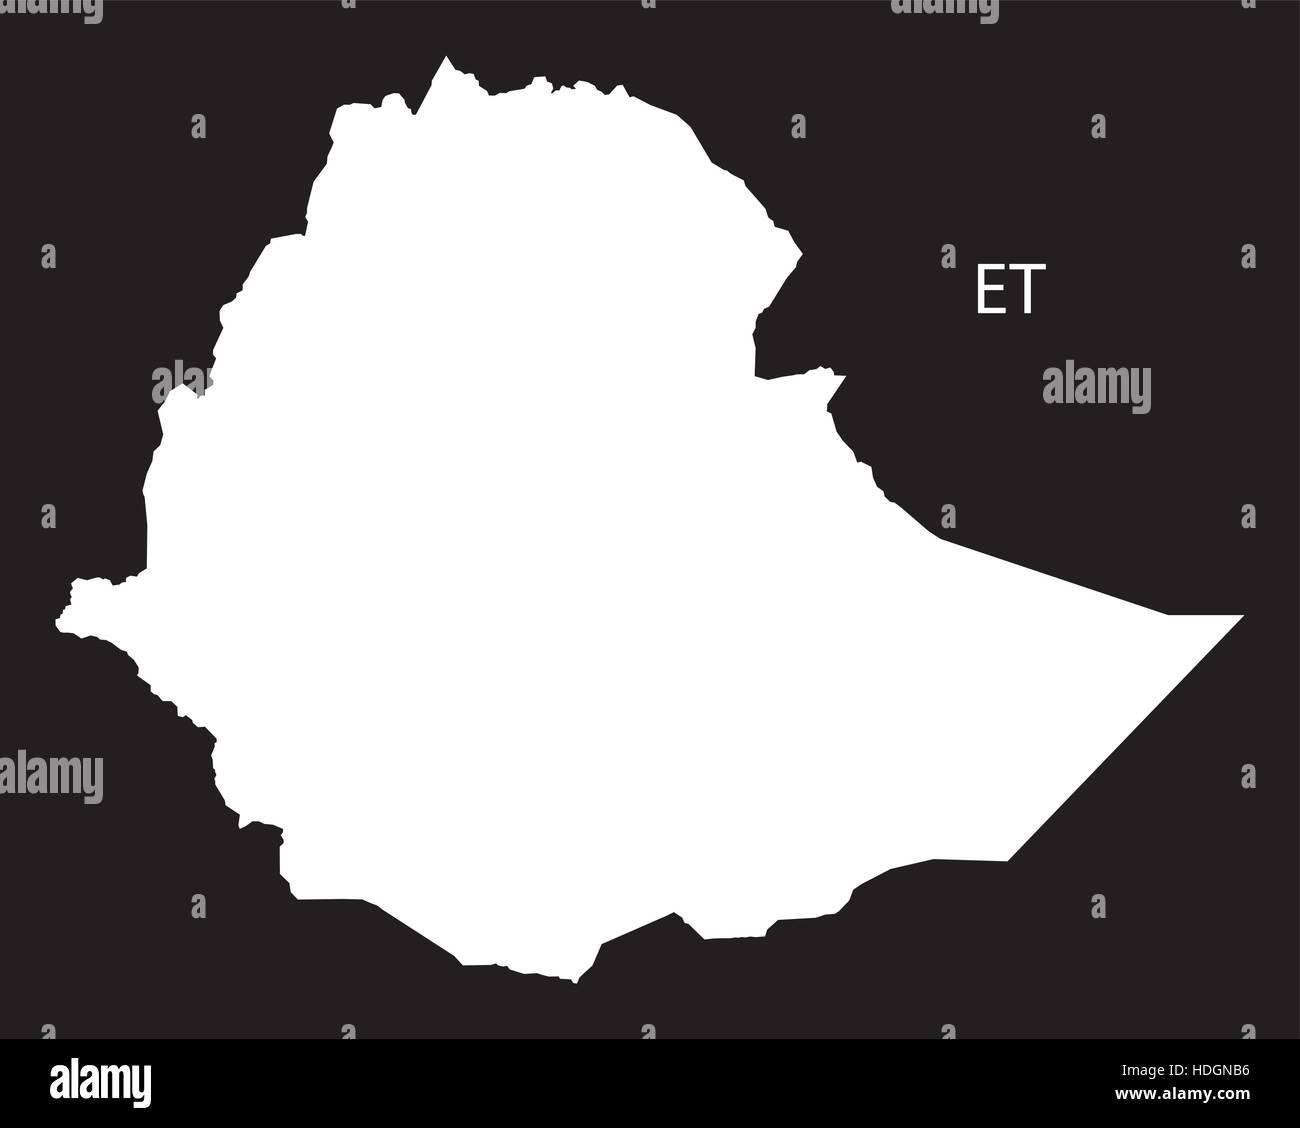 Ethiopia Map black and white illustration - Stock Vector